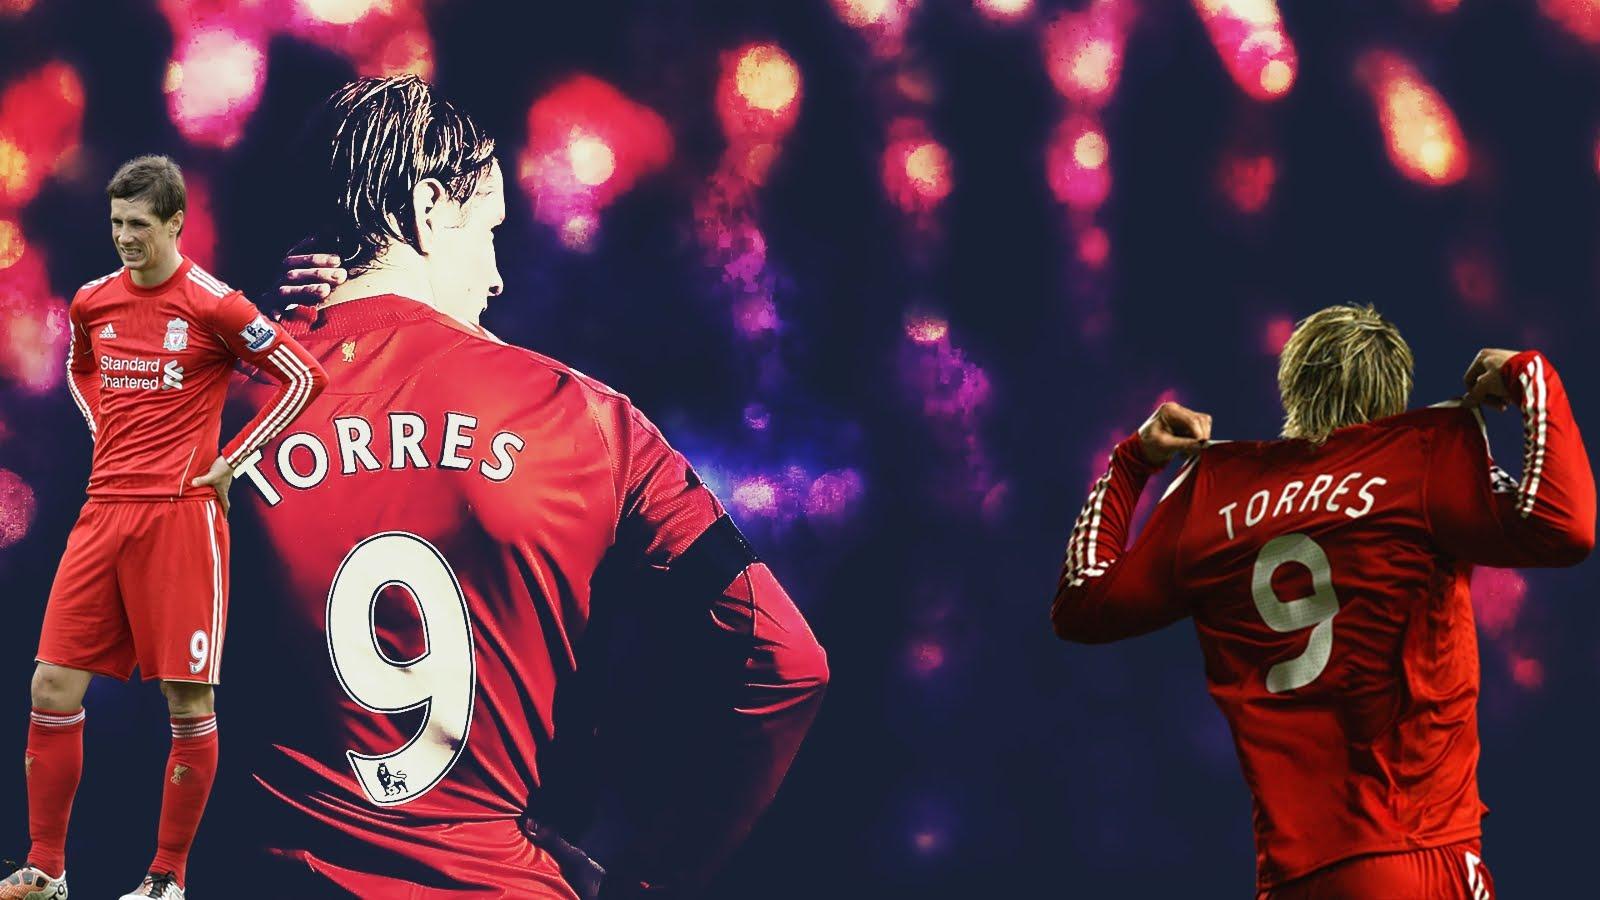 Fernando Torres, cảm ơn đời đã xô anh tới Premier League - Ảnh 6.